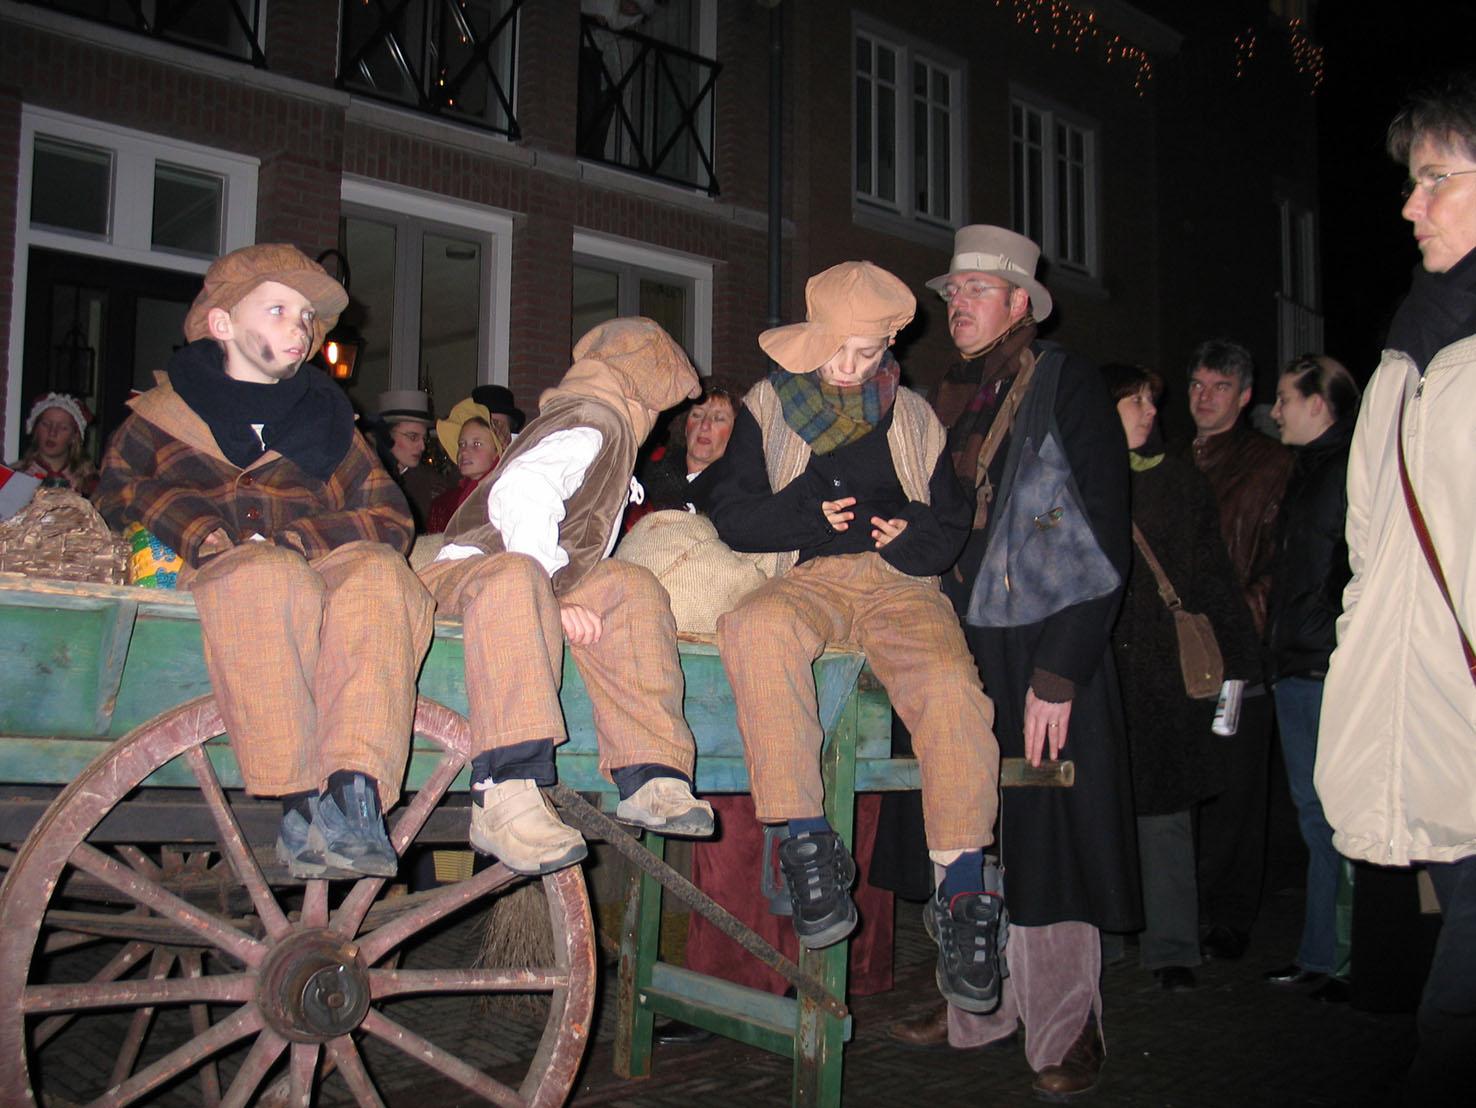 084 - Kerstmarkt Helmond 2003.jpg